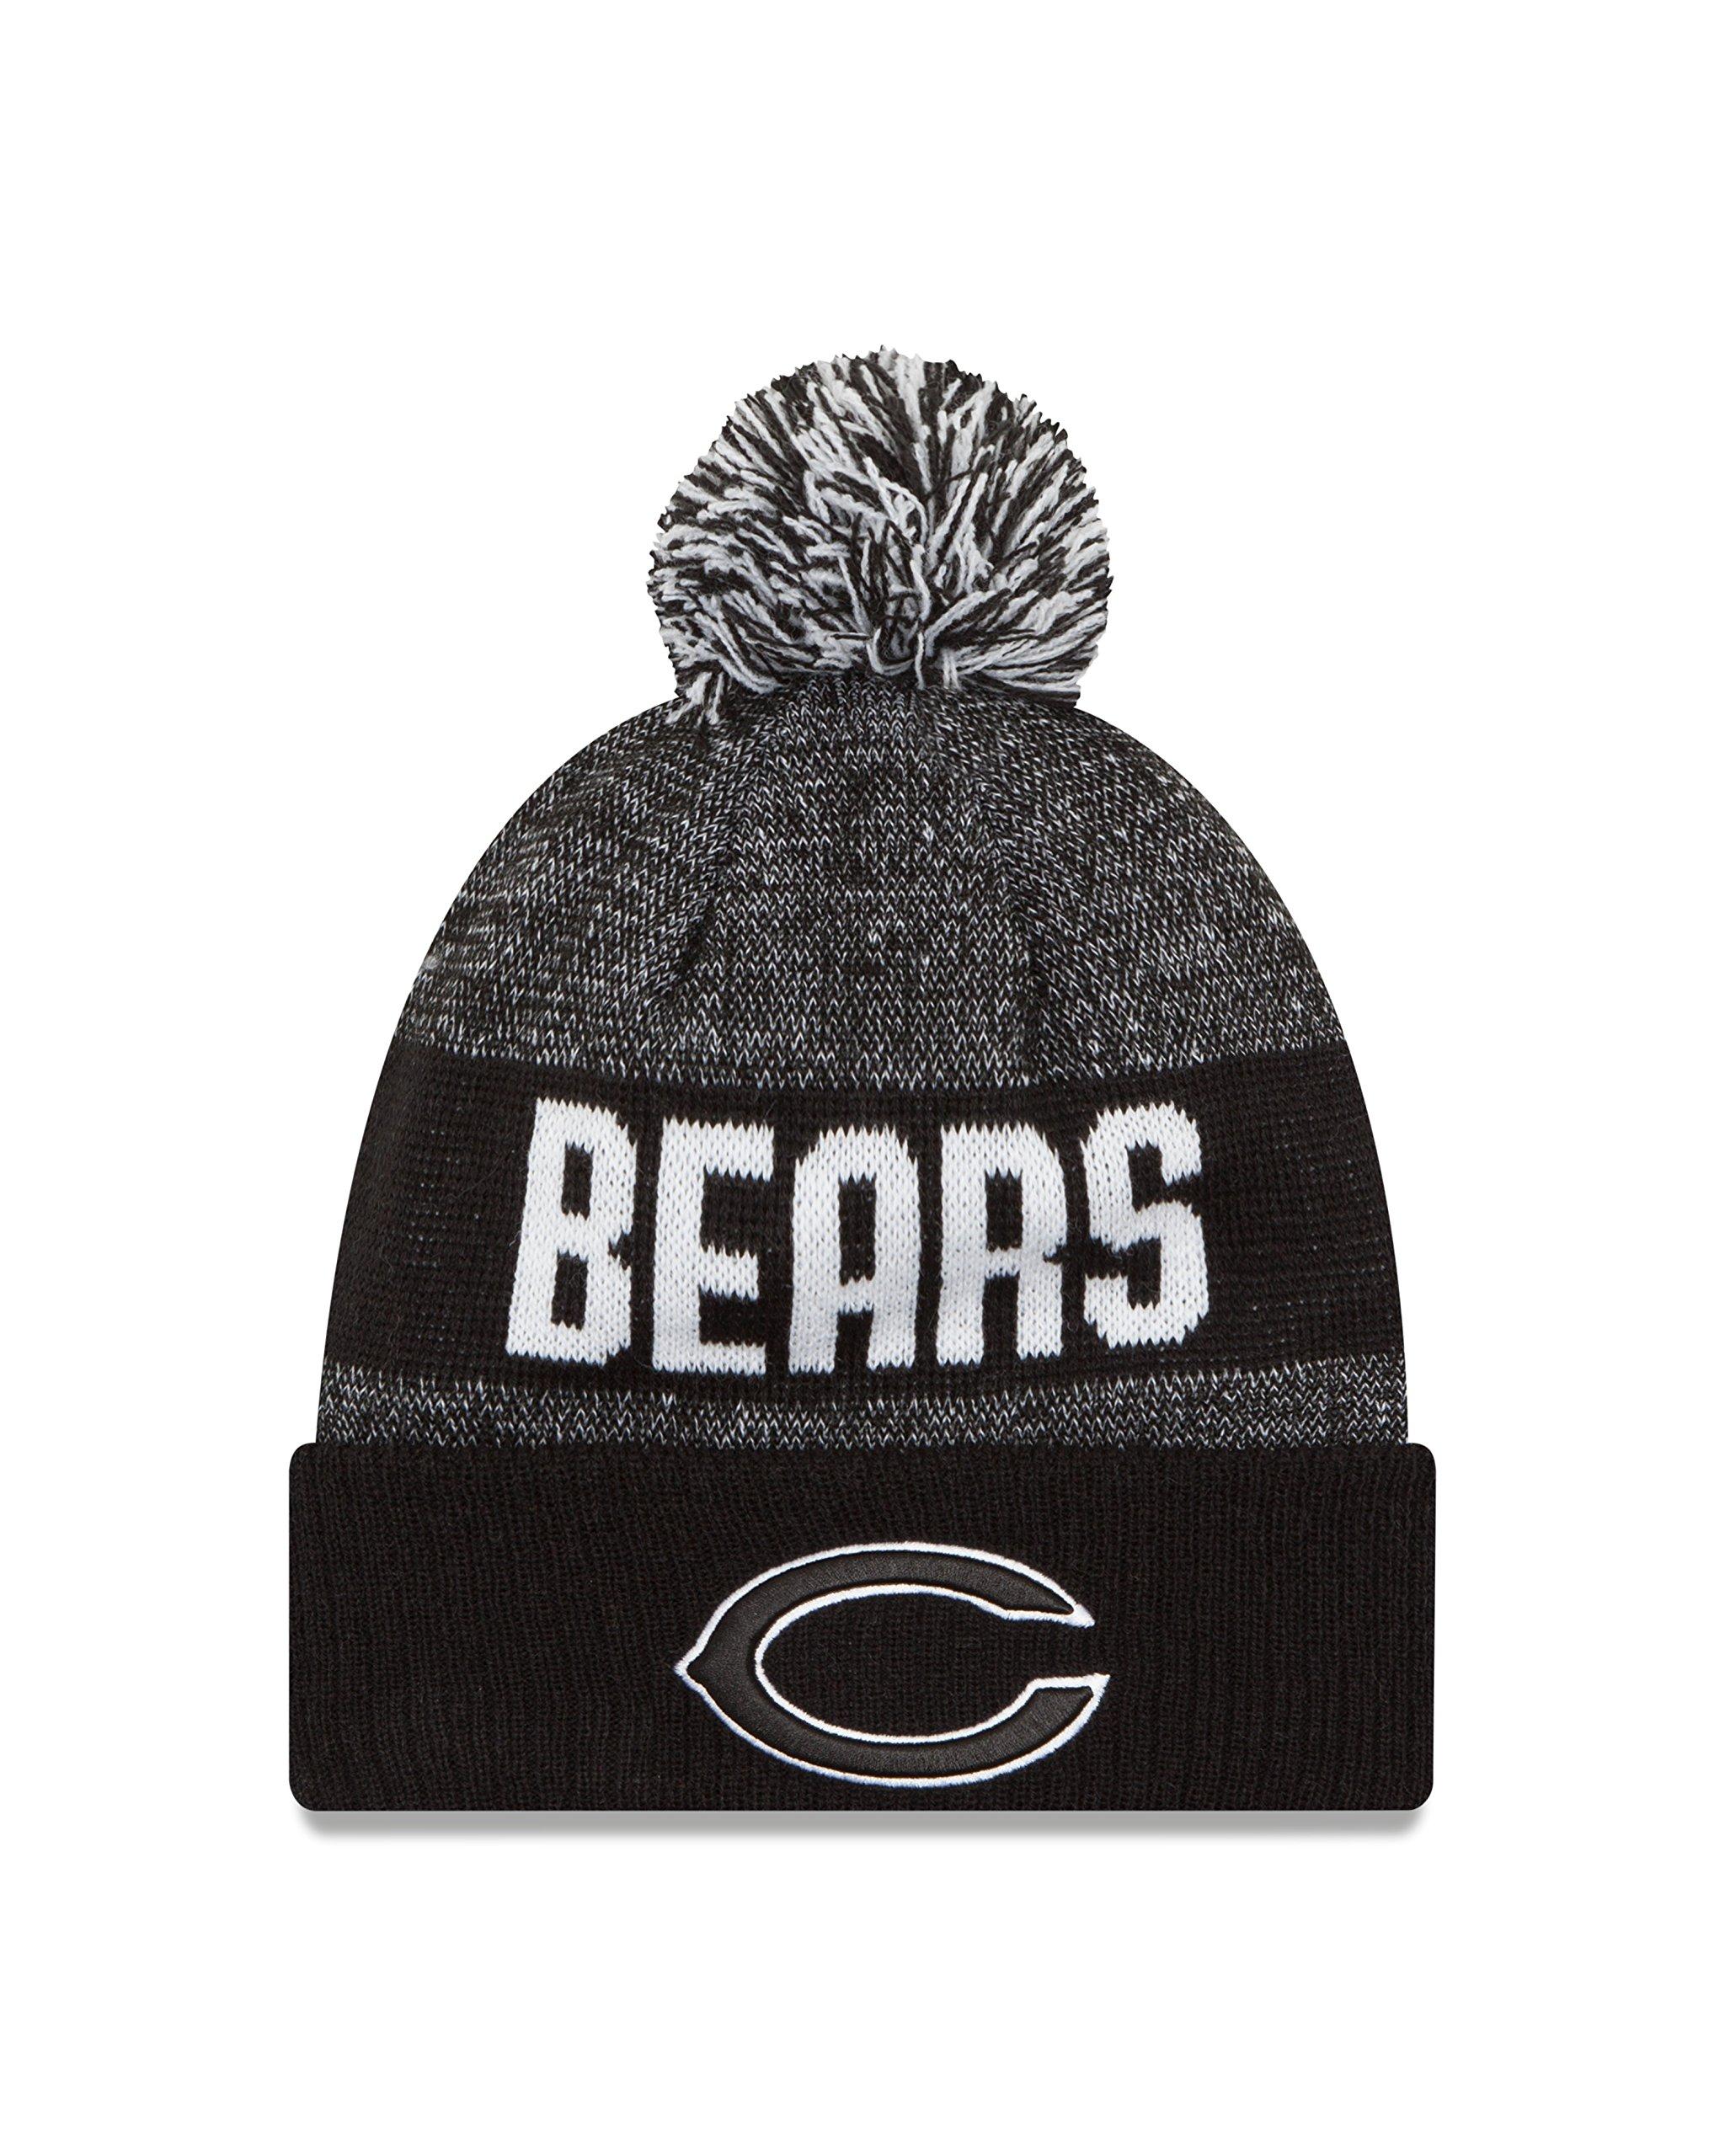 New Era NFL Chicago Bears 2016 Sport Knit Beanie, One Size, Black/White